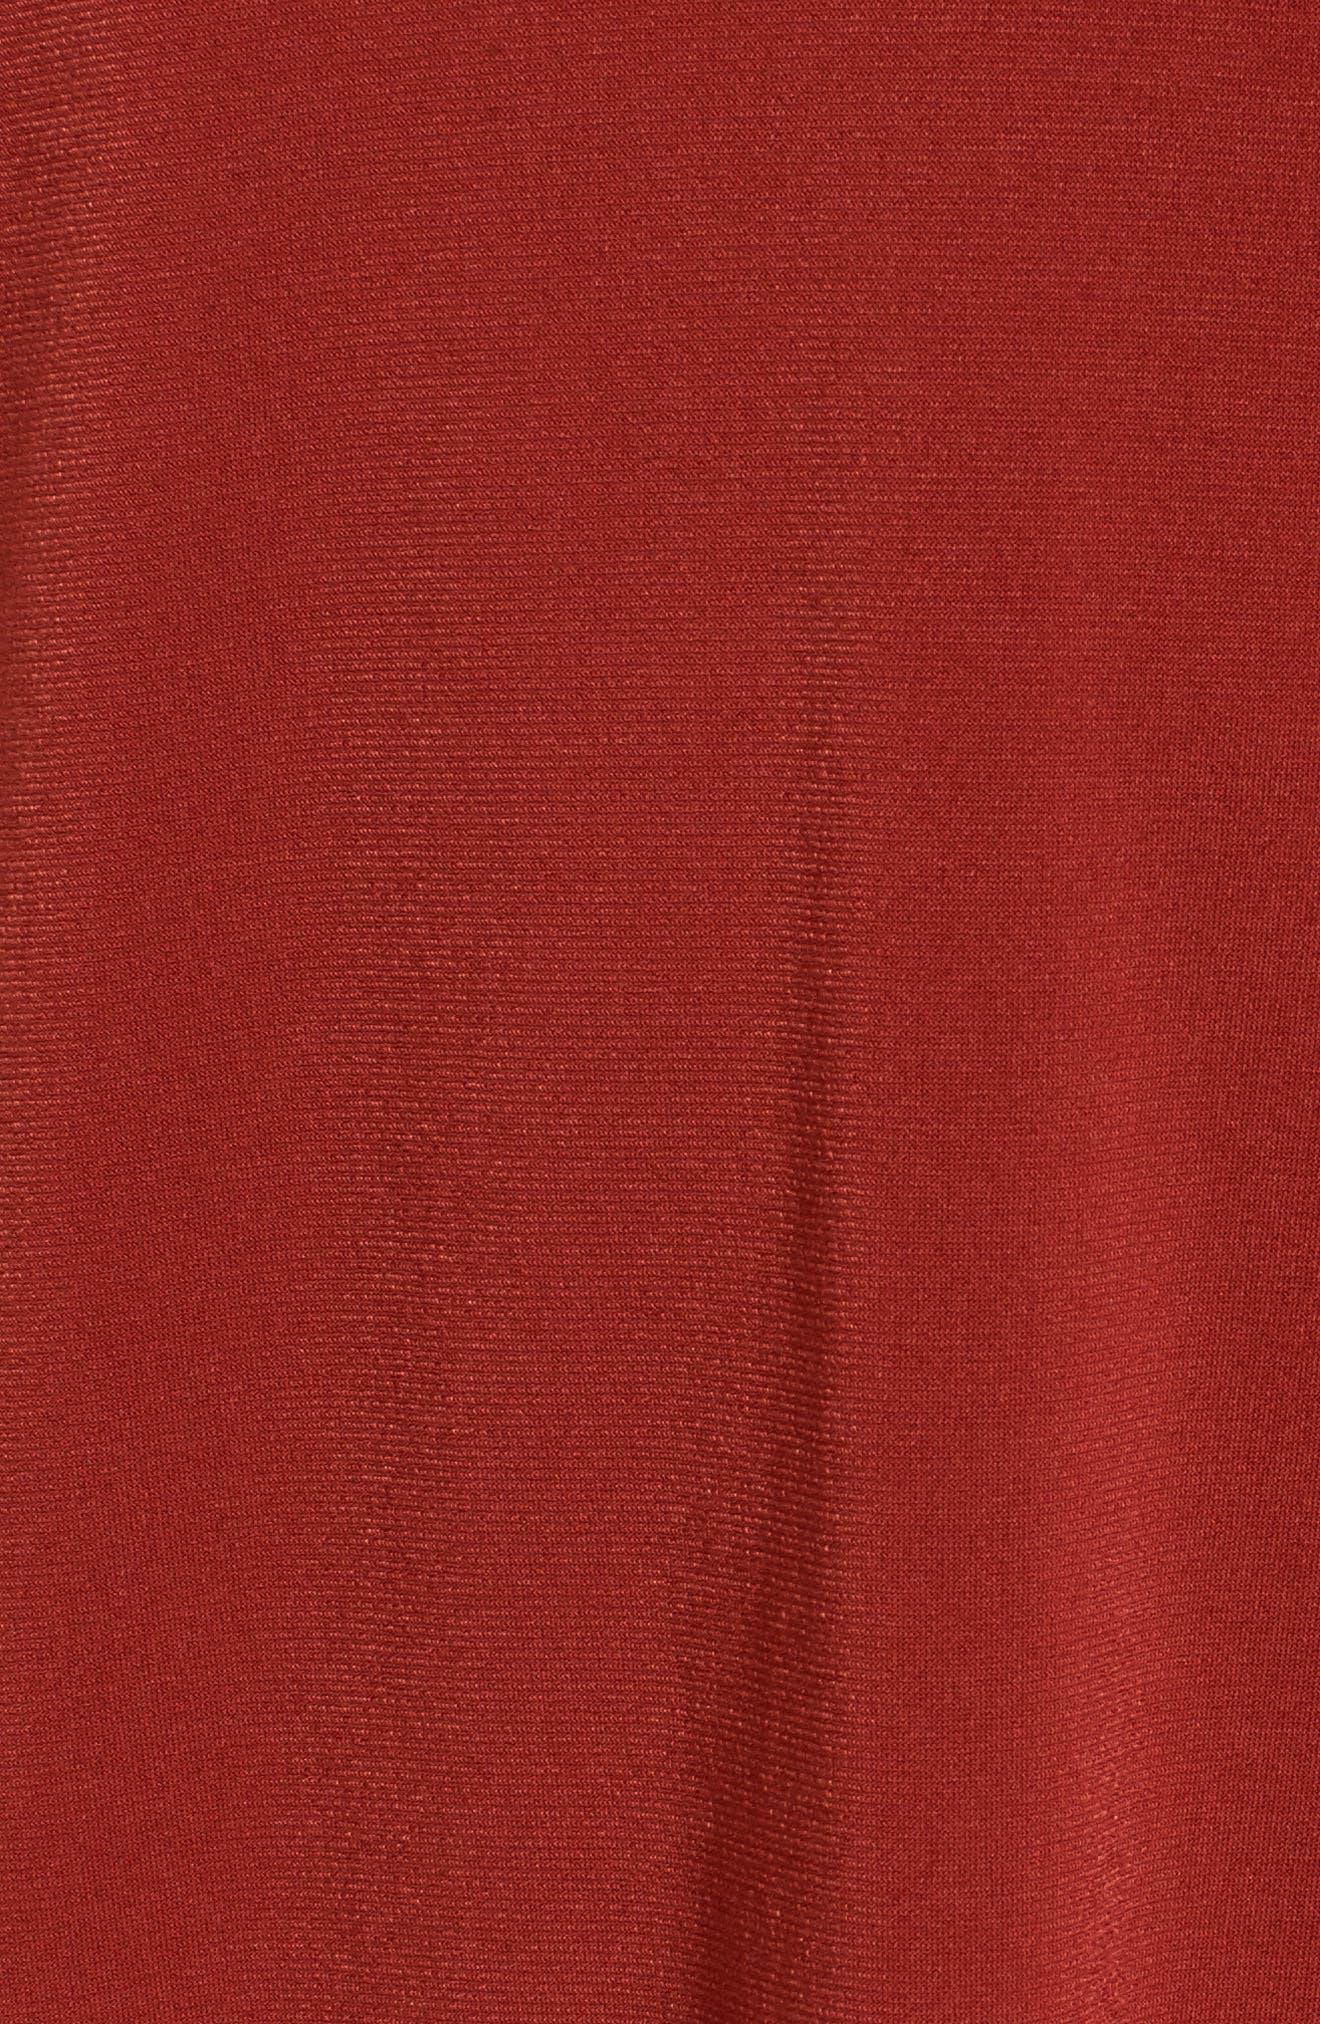 V-Neck A-Line Dress,                             Alternate thumbnail 15, color,